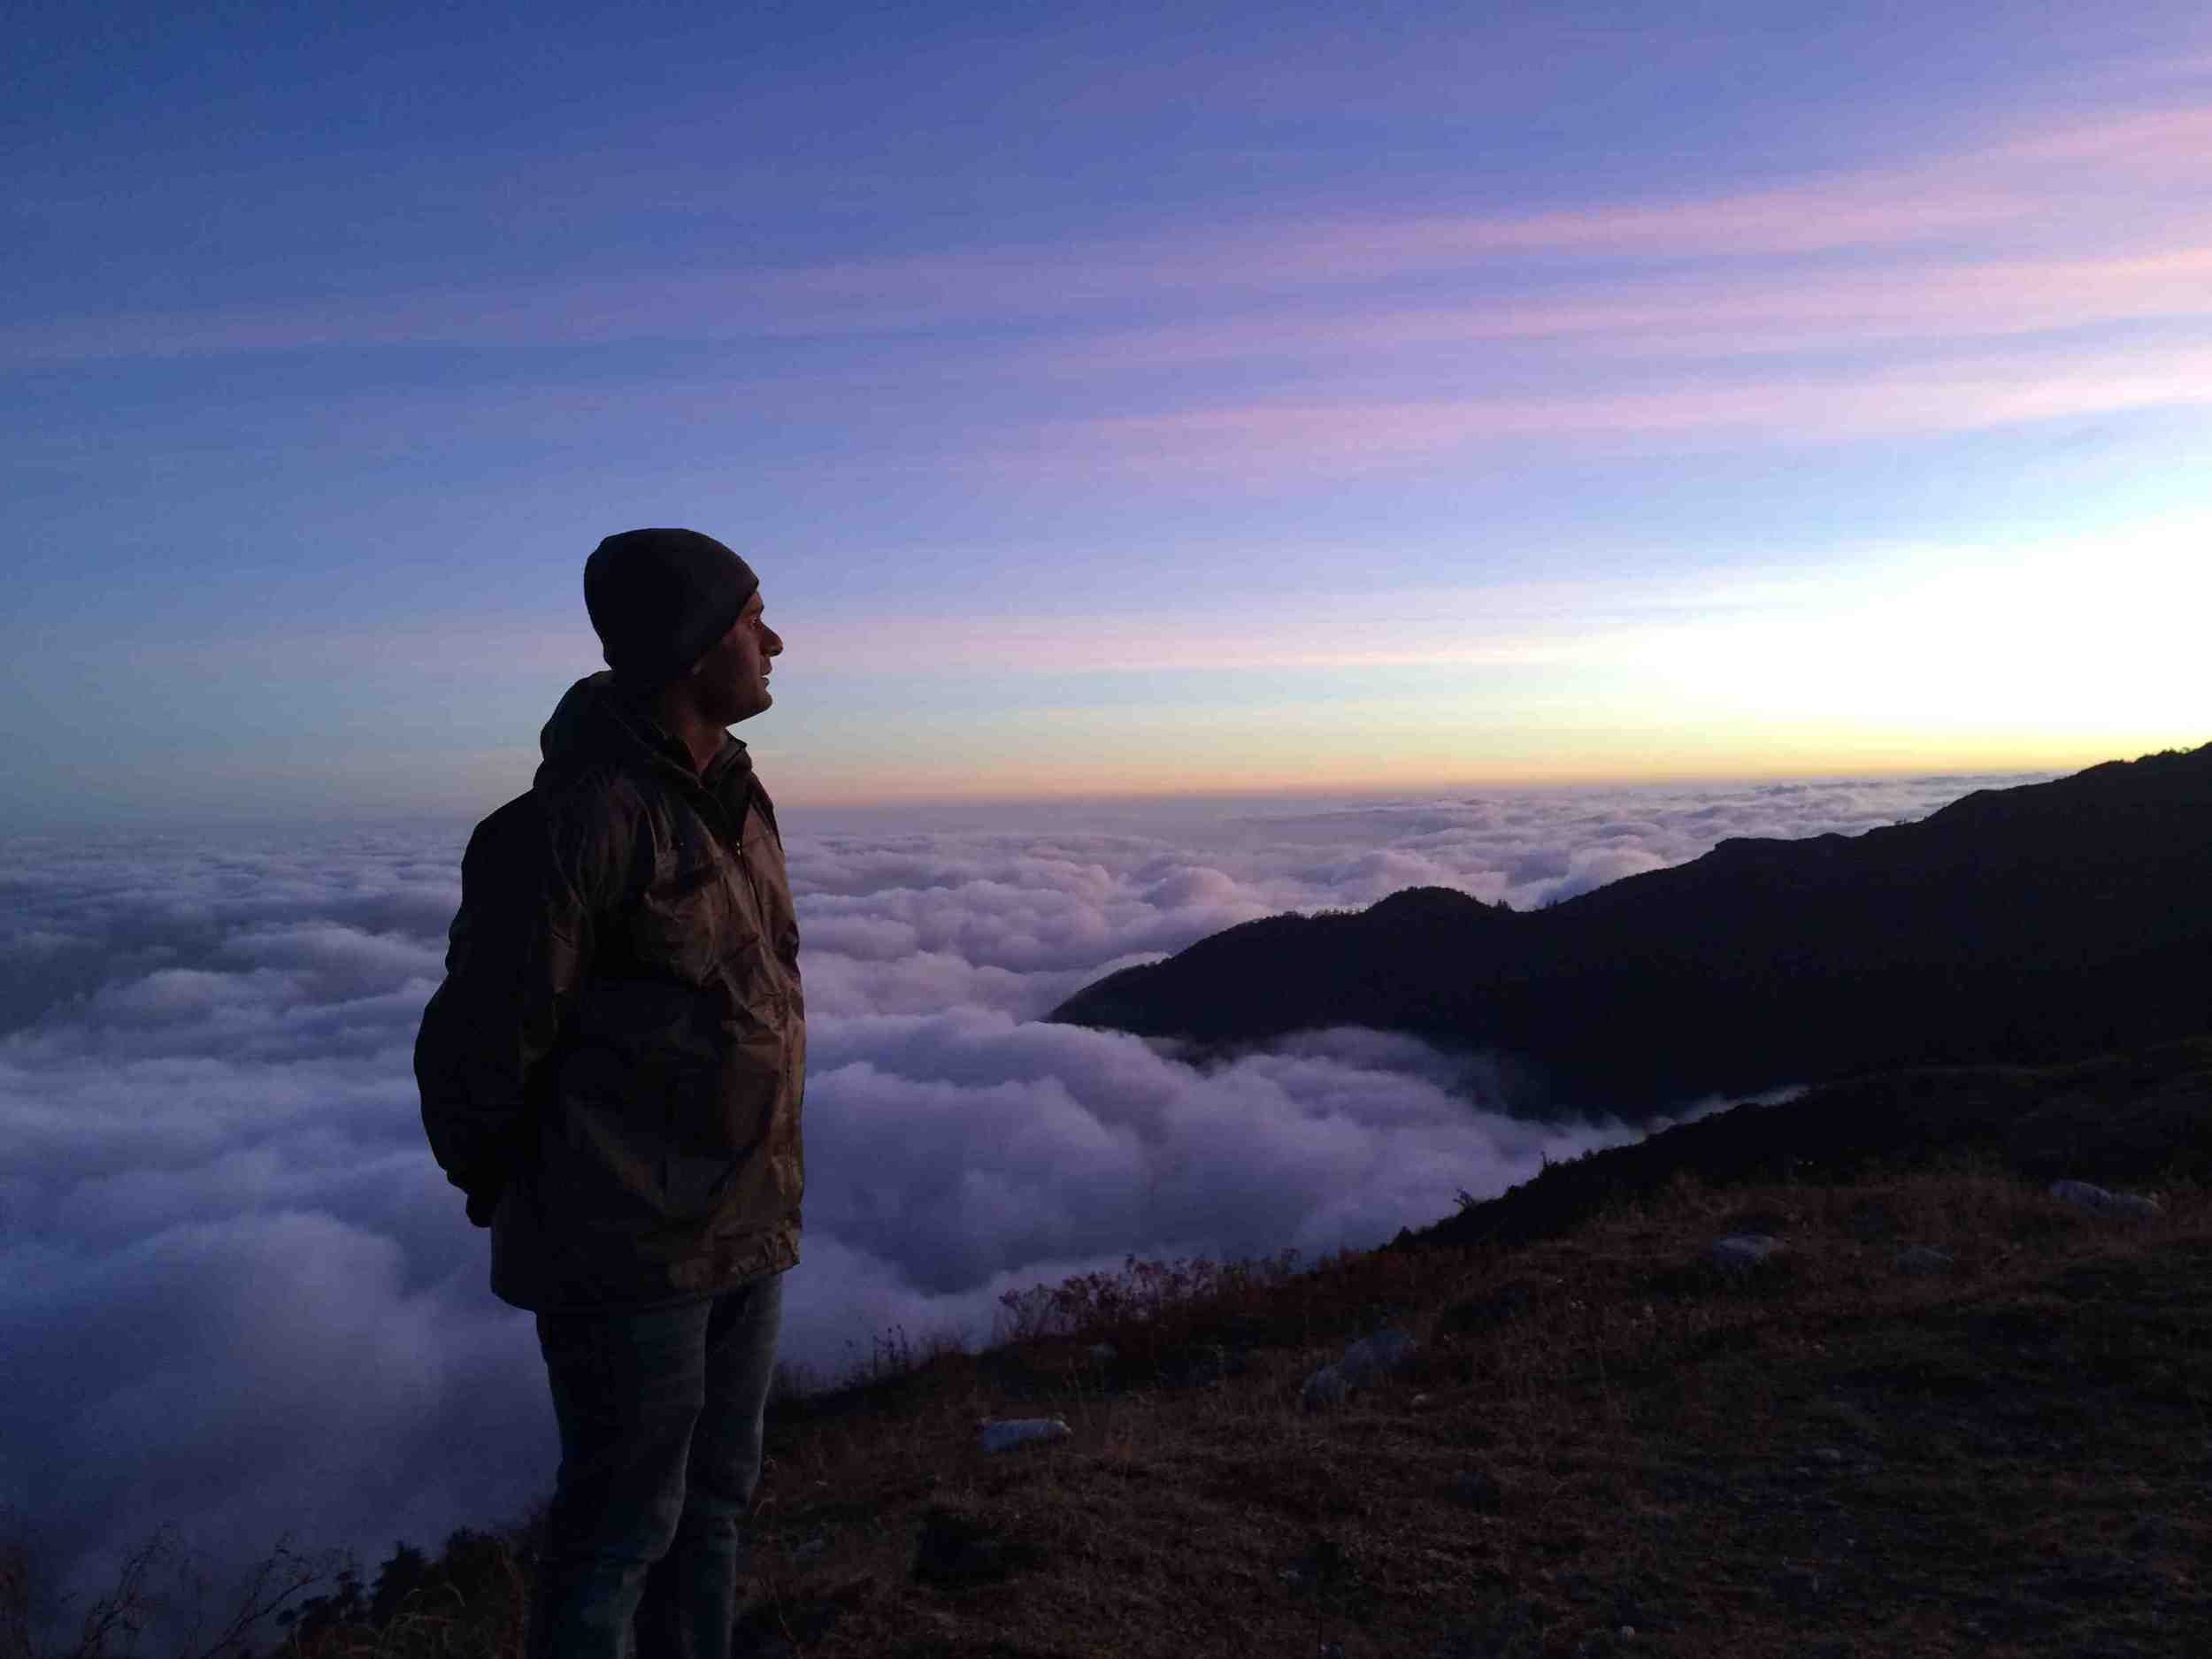 Sunrise at Gnathang valley